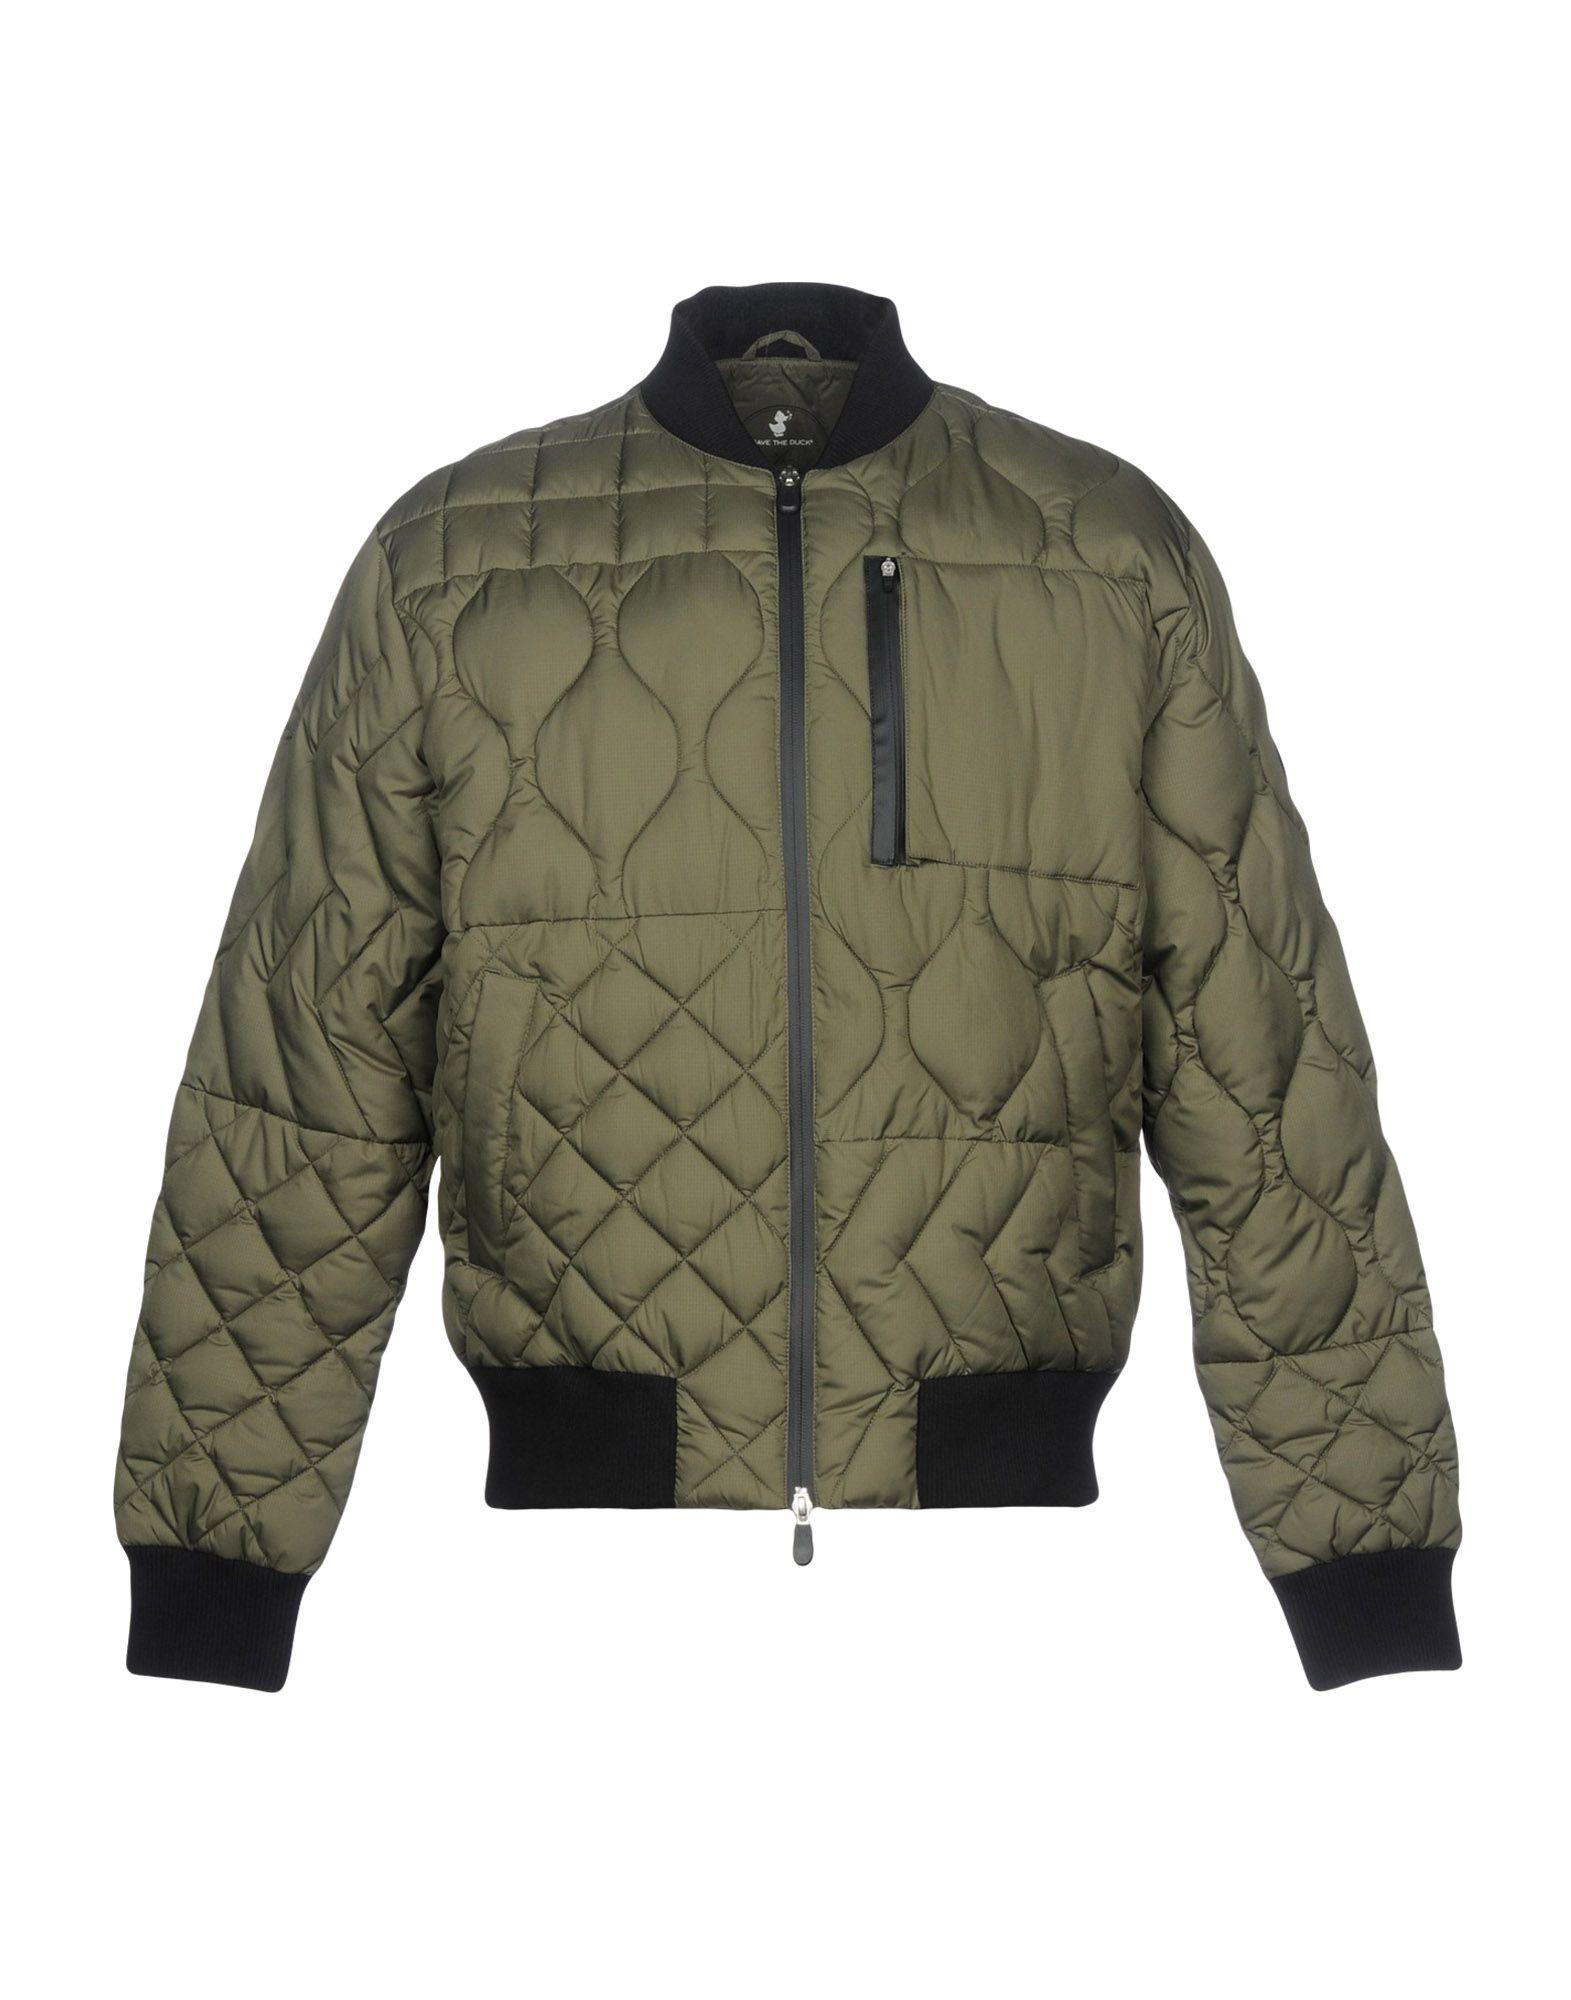 SAVE THE DUCK x CHRISTOPHER RAEBURN Куртка игровой набор hasbro iron man летающие фигурки от 6 лет а1735